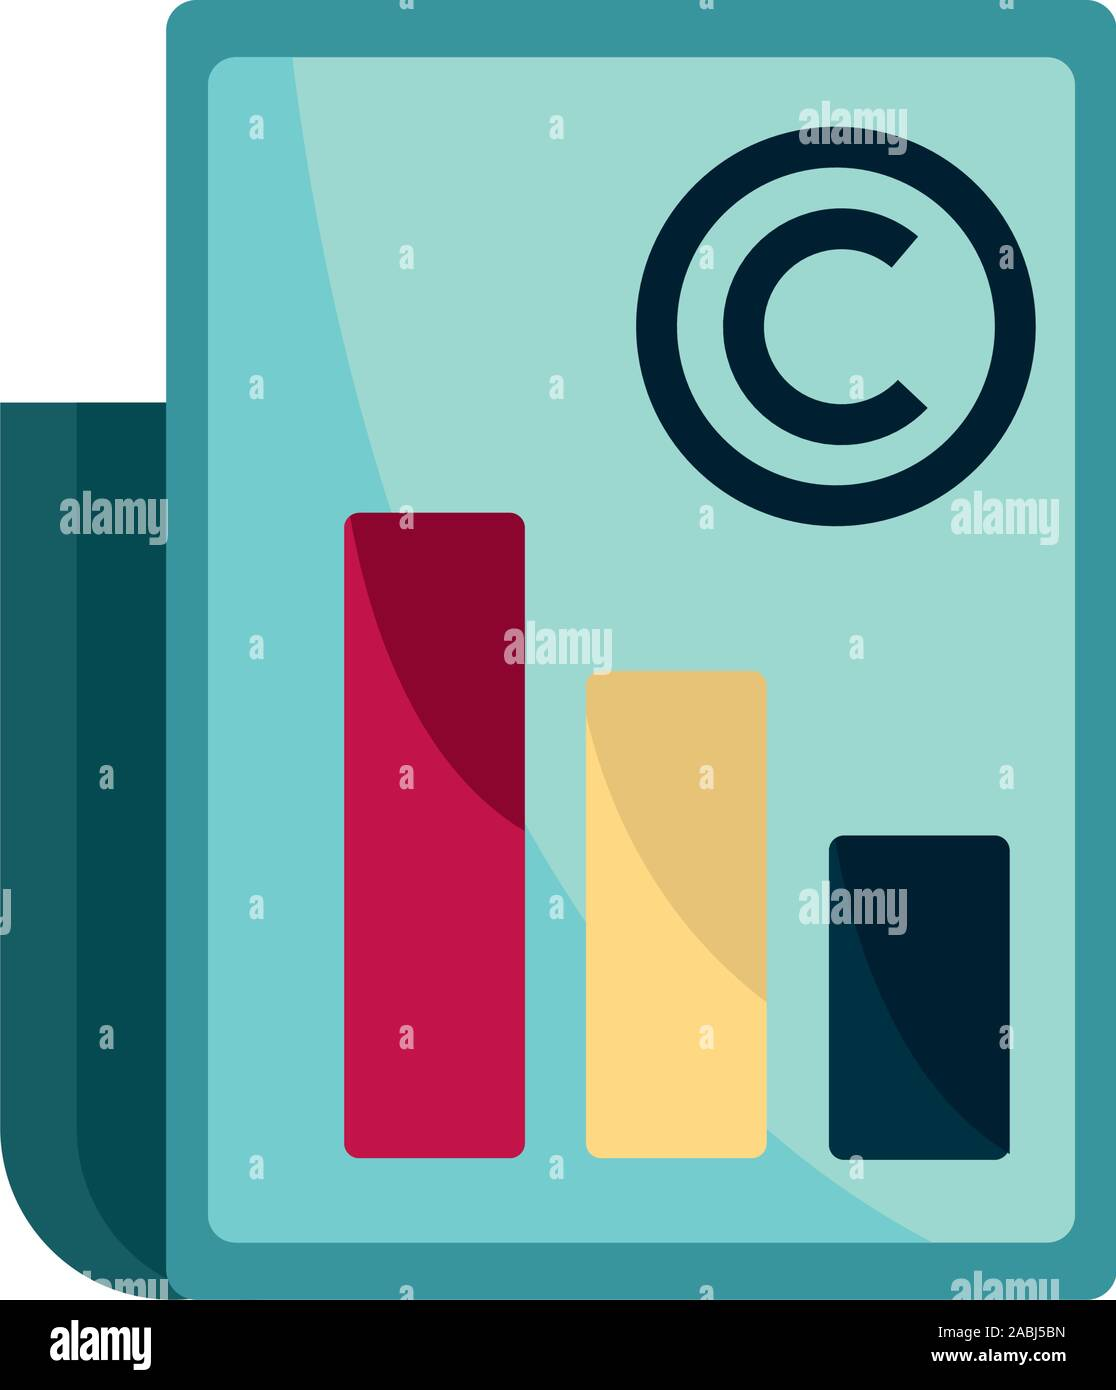 diagram document property intellectual copyright icon vector illustration Stock Vector